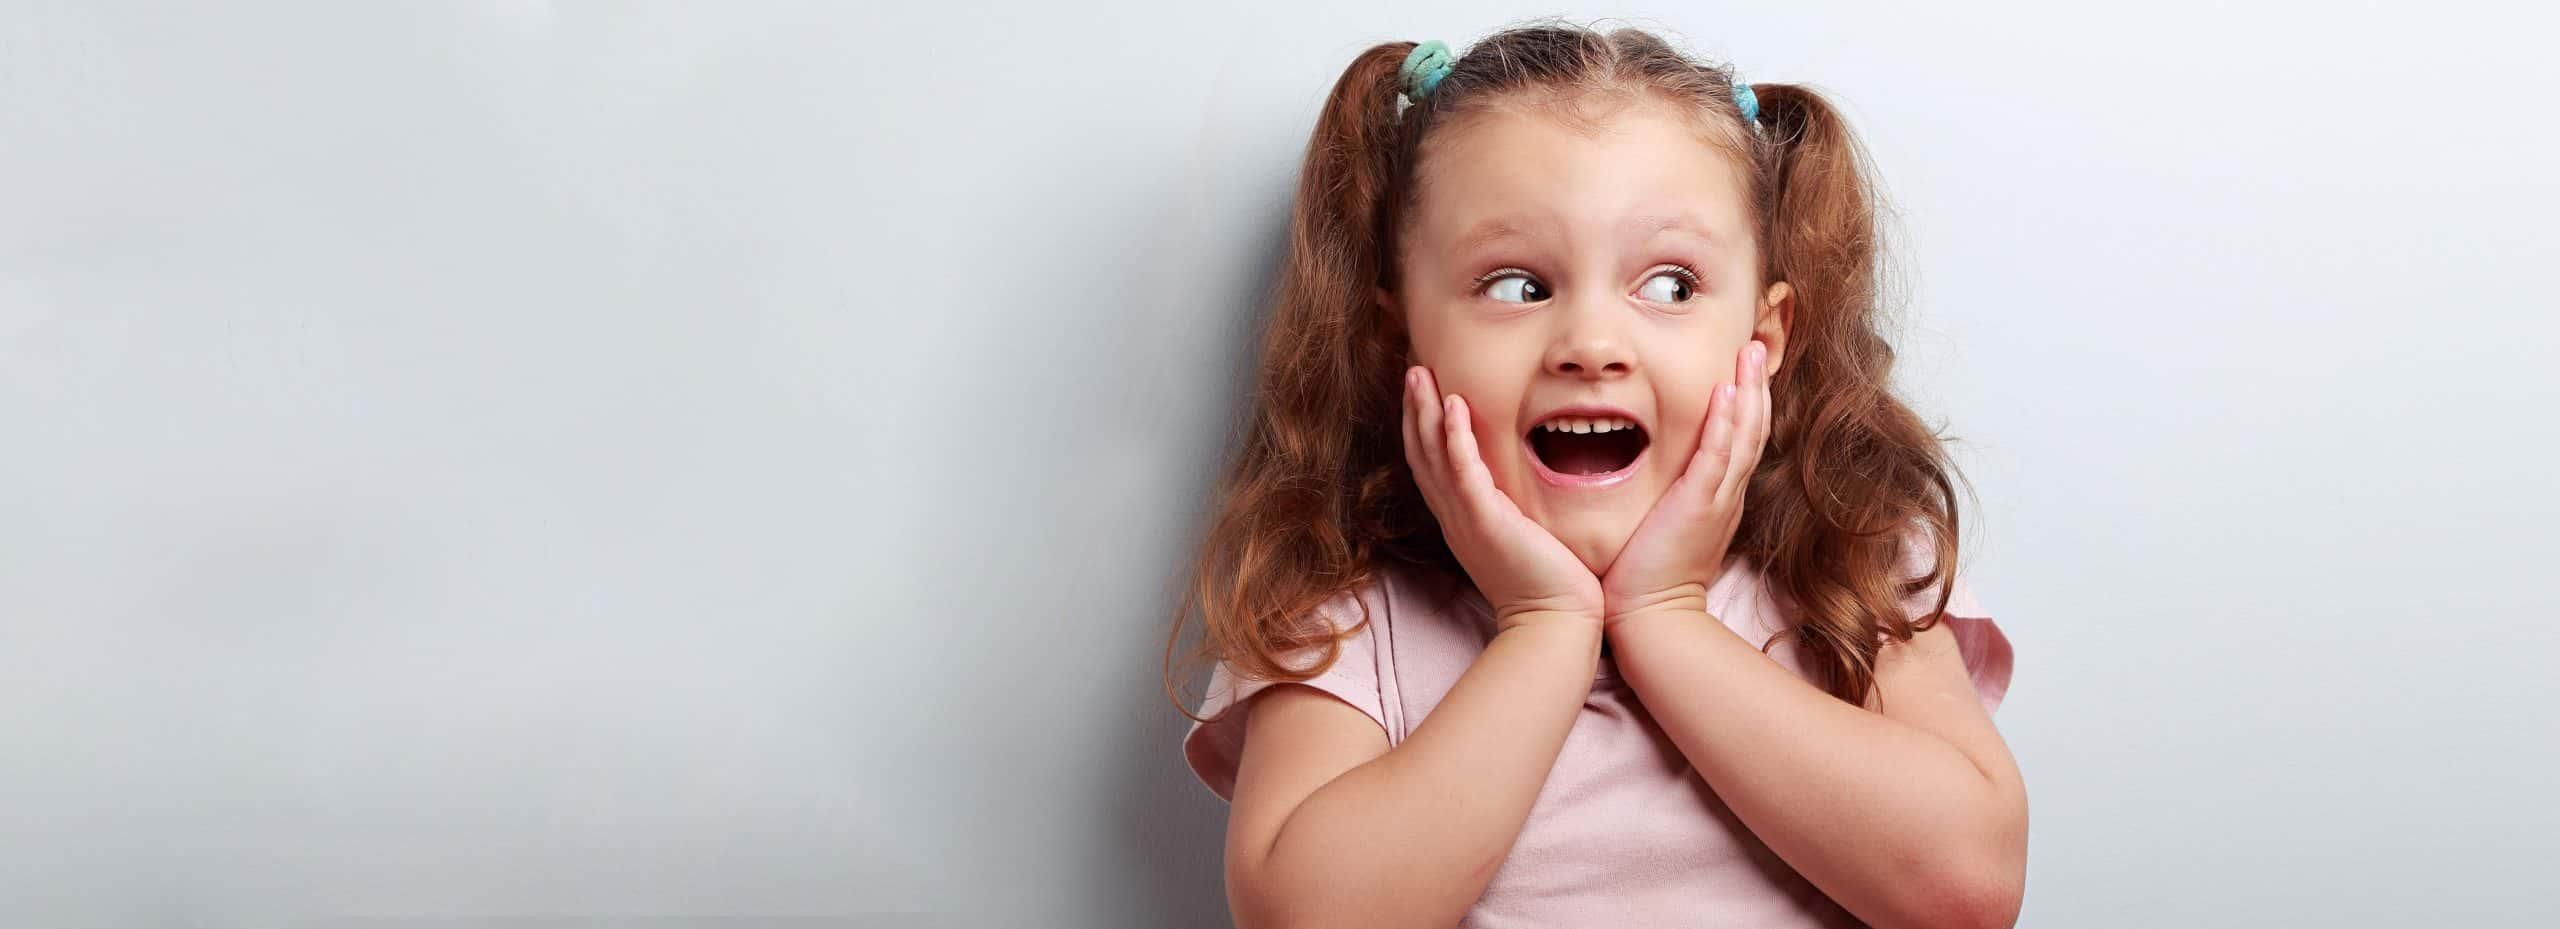 Can Bad Teeth be Genetic?